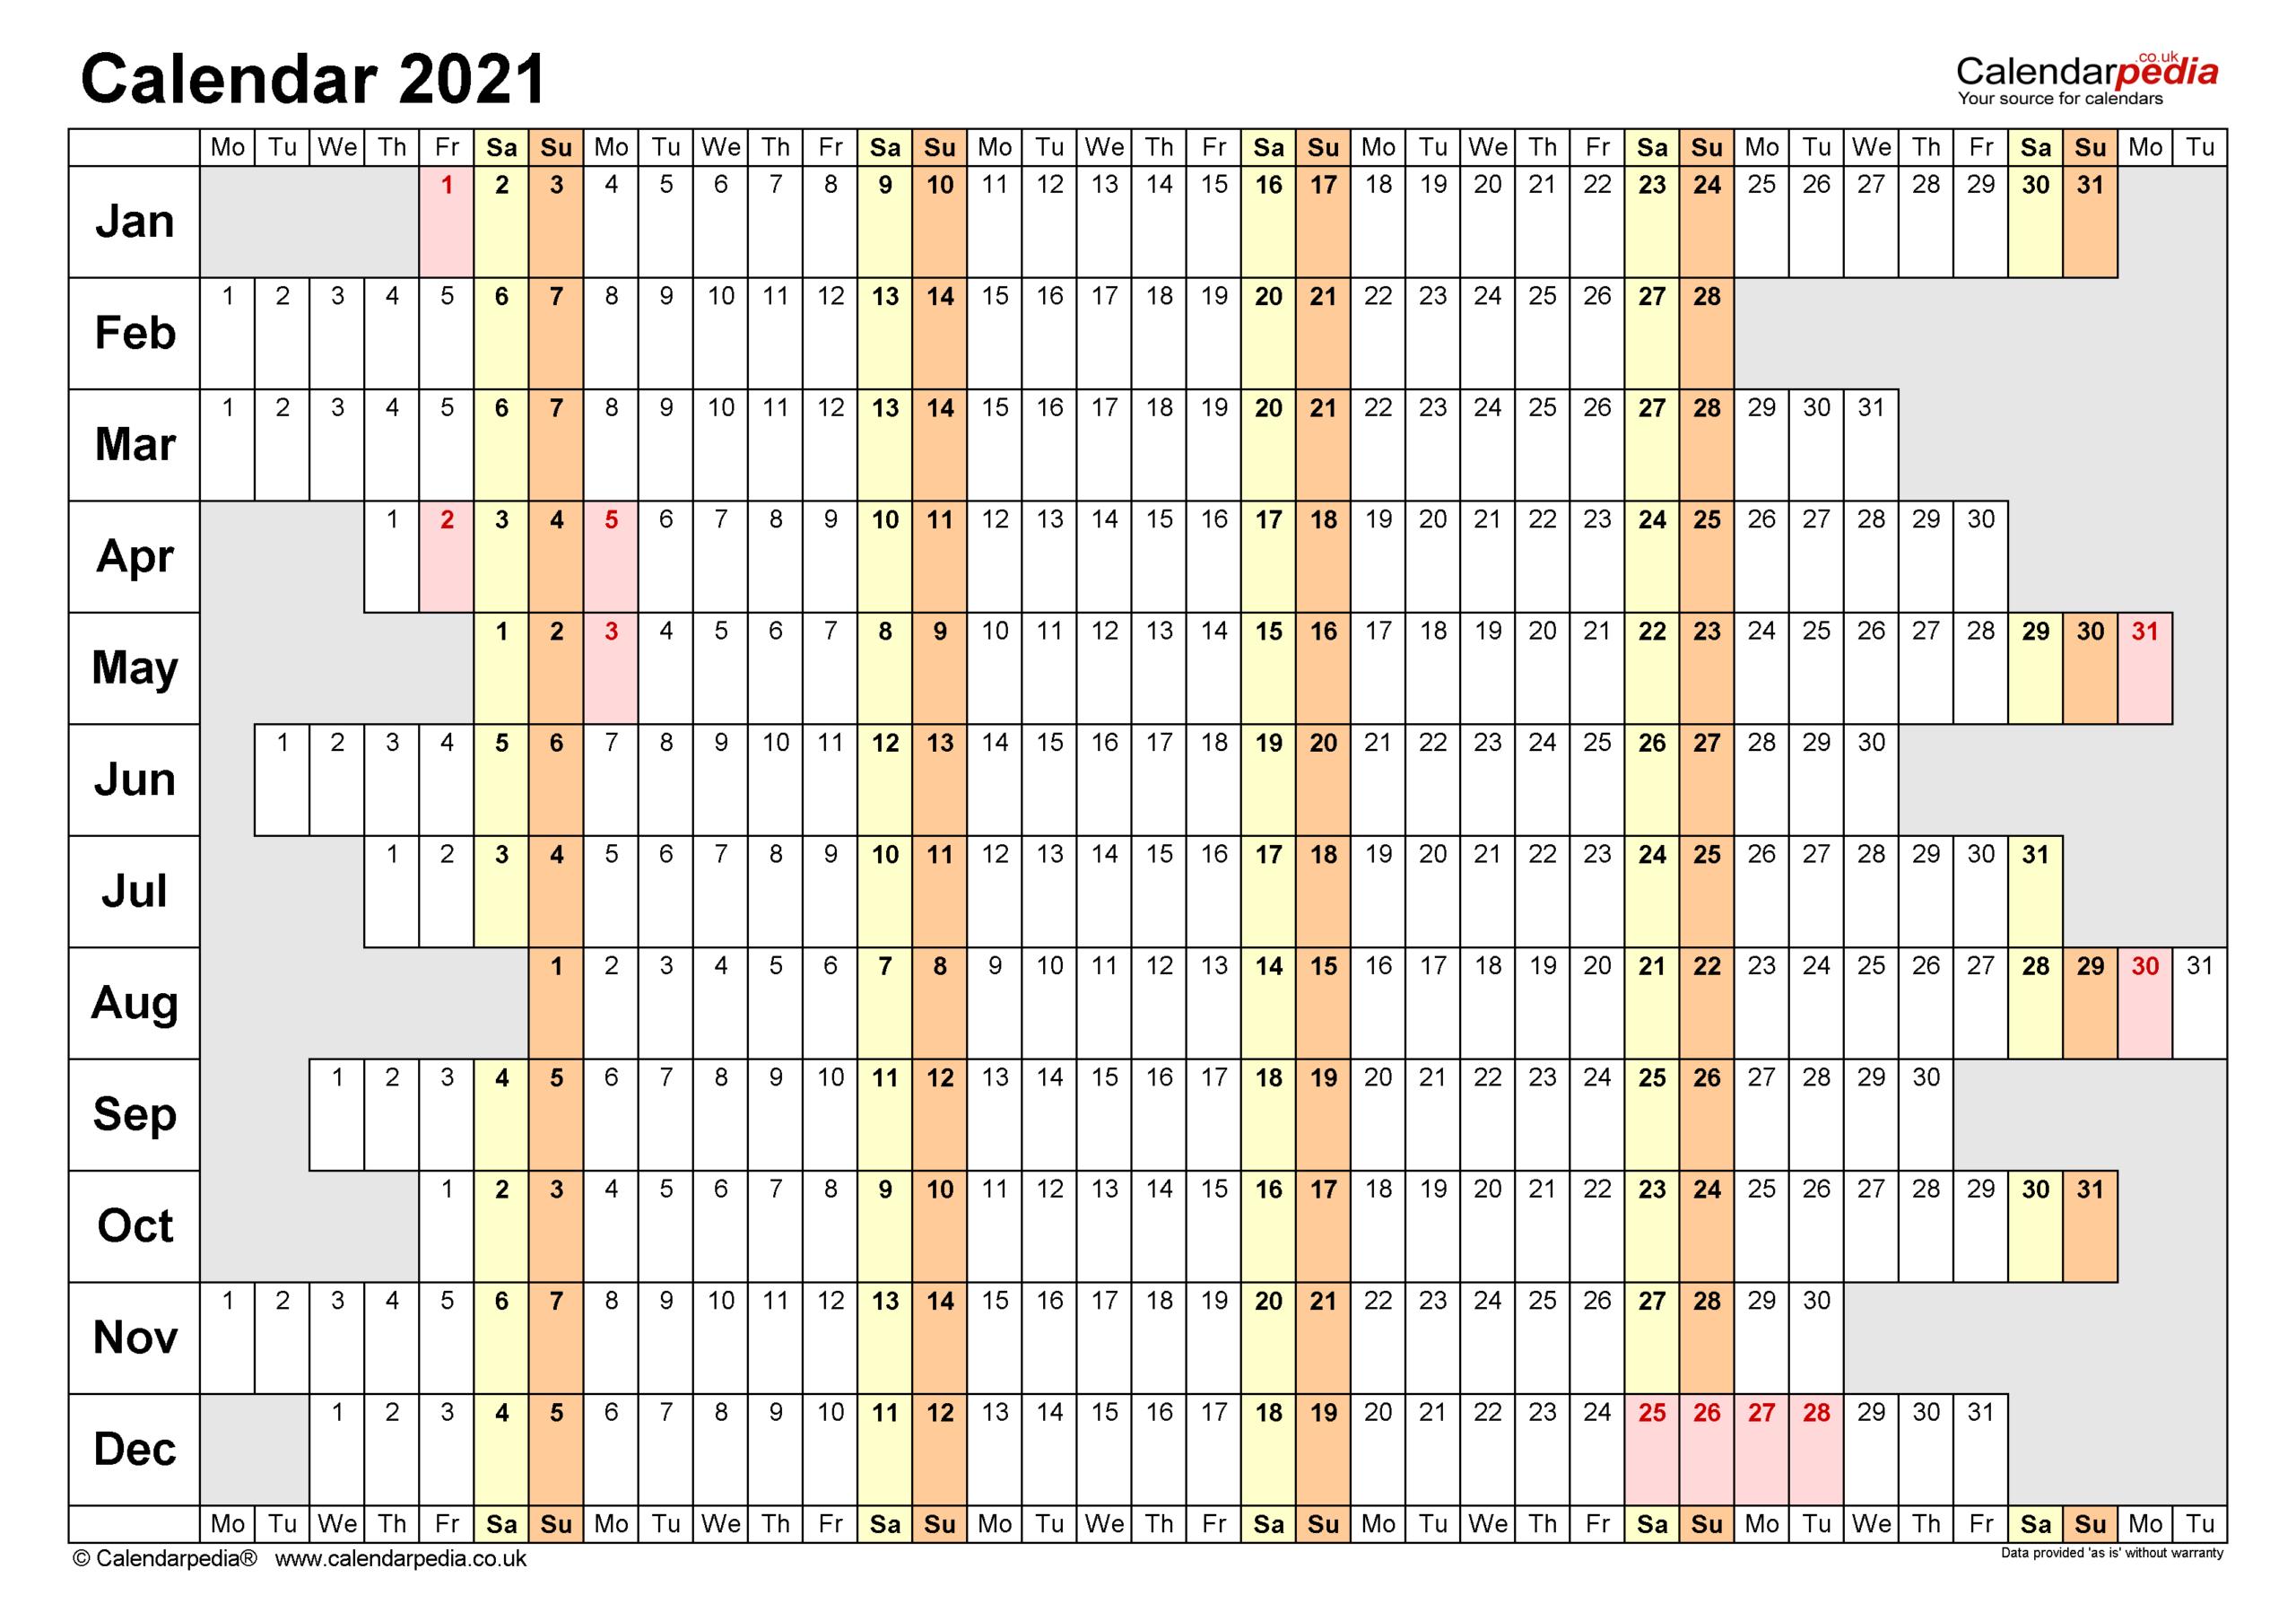 Calendar 2021 (Uk) - Free Printable Microsoft Excel Templates for Shift Calendar 2021